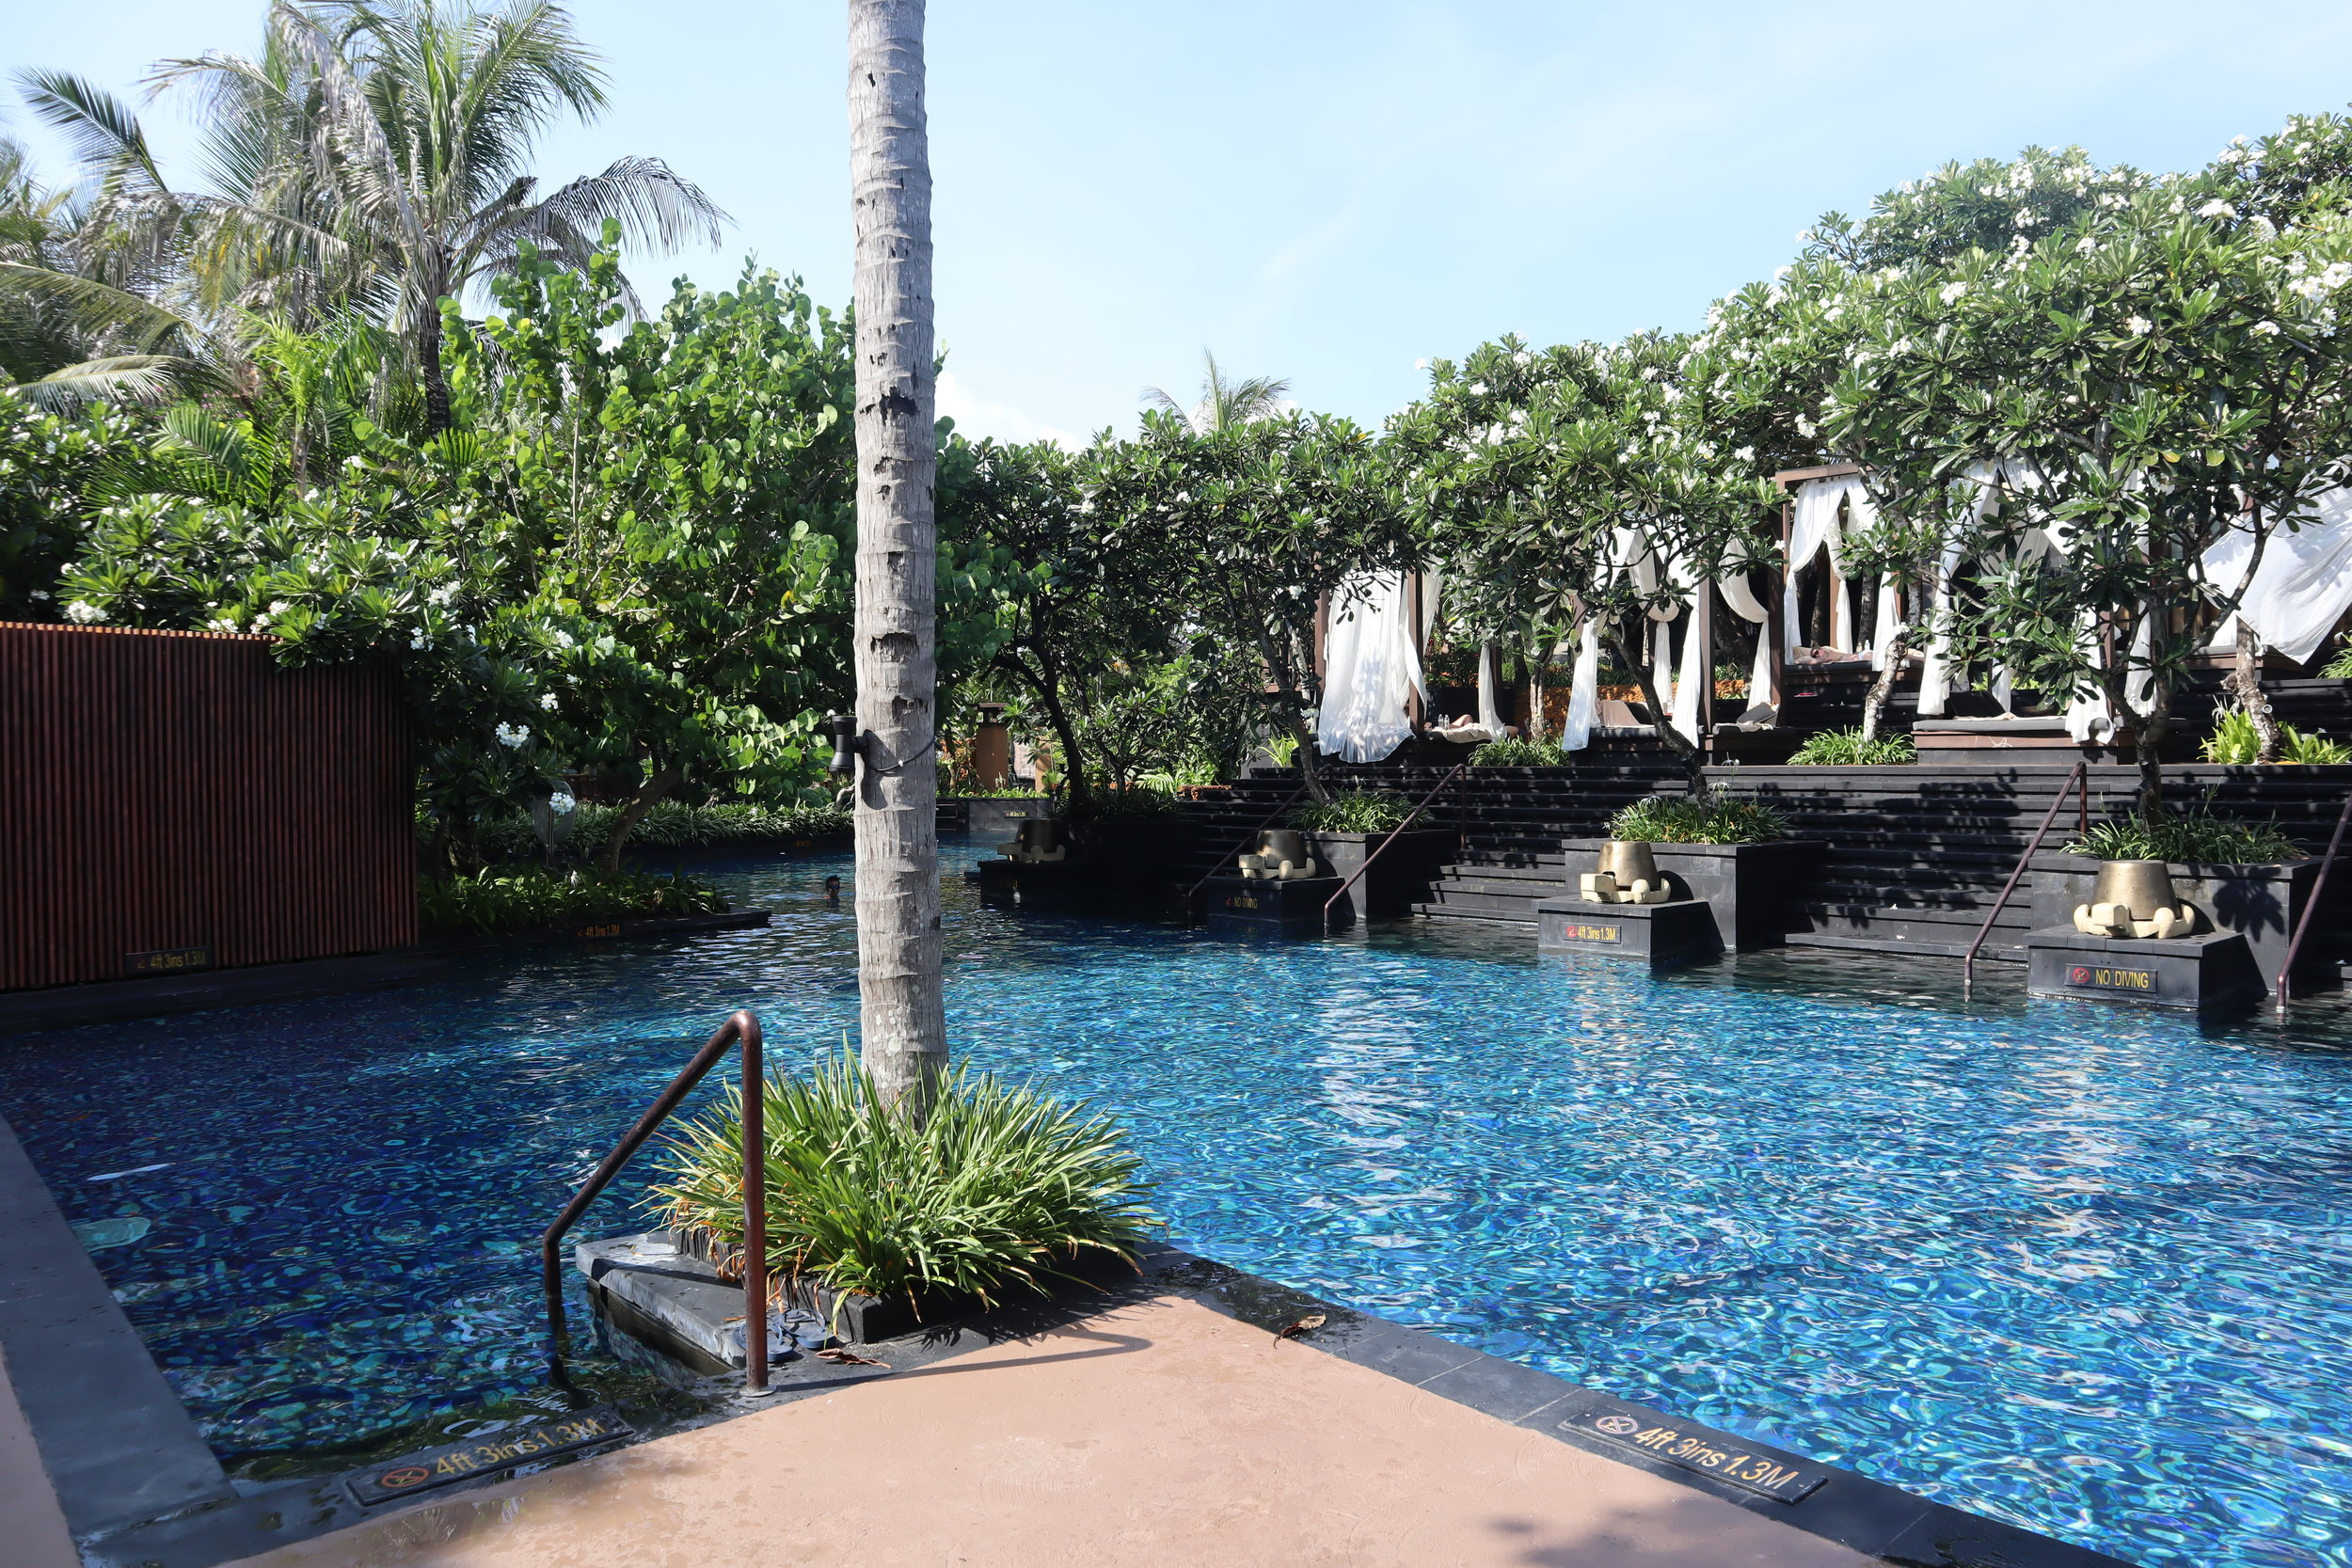 St. Regis Bali – Poolside